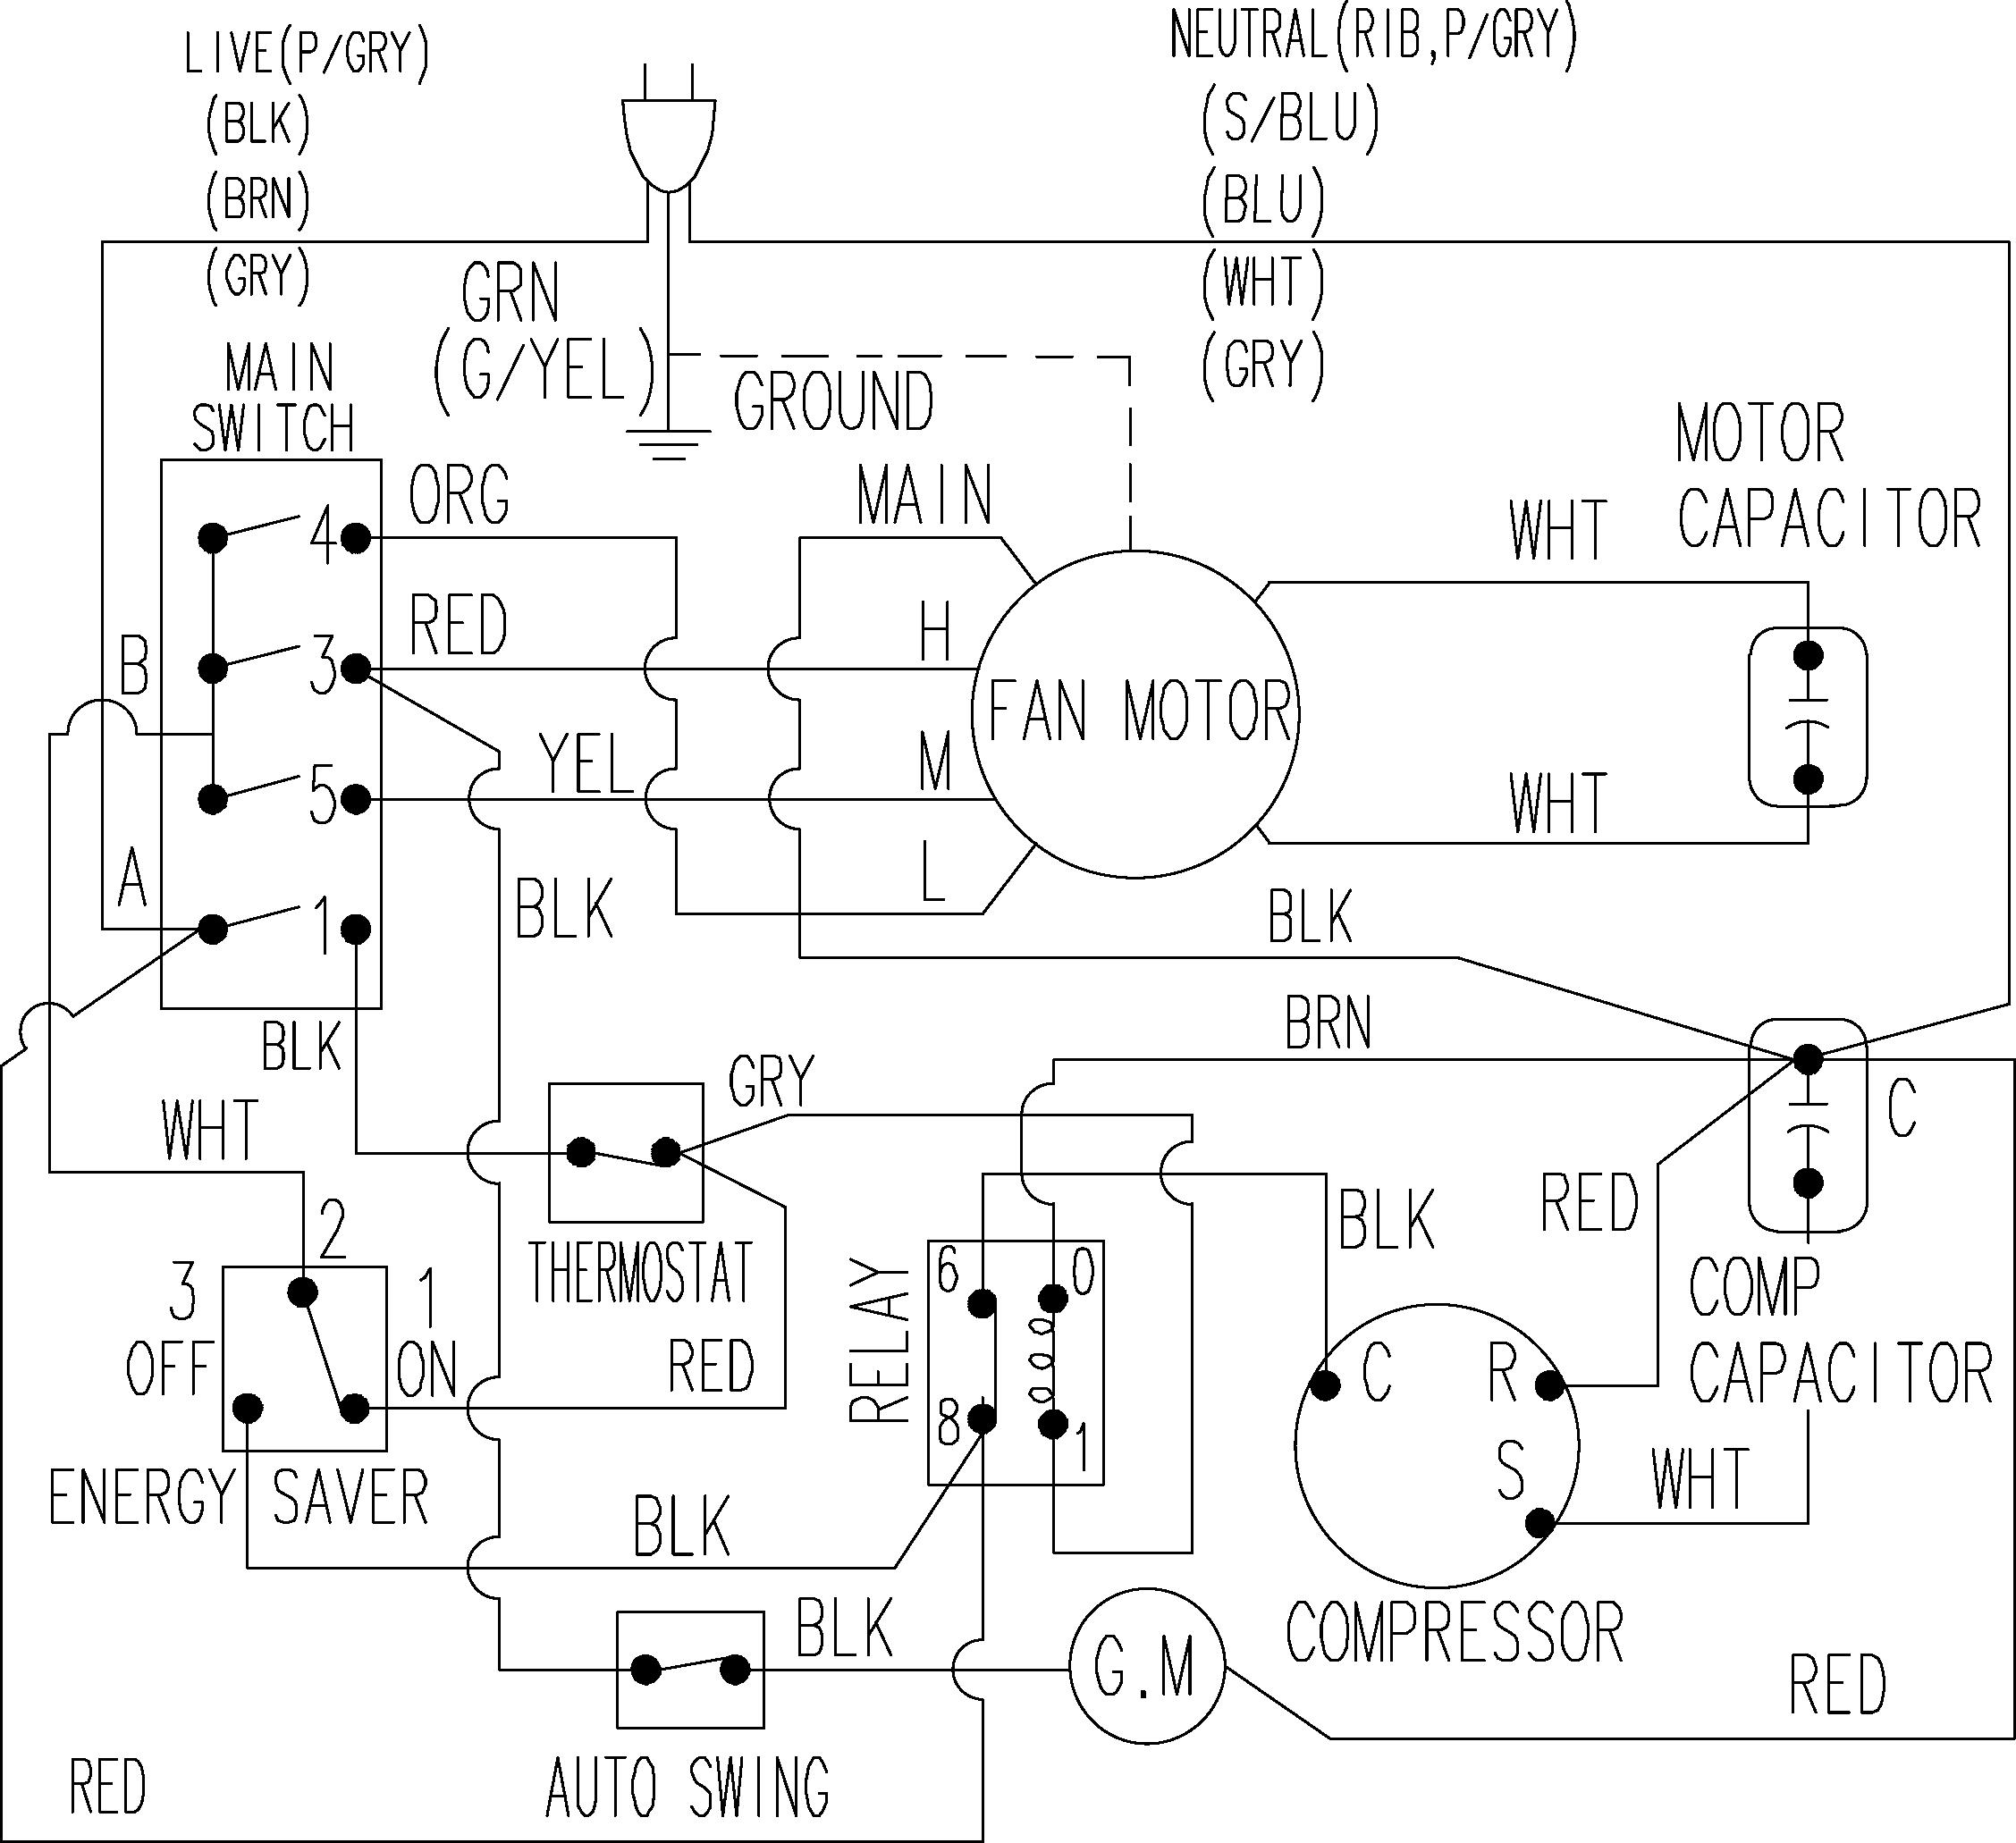 1969 gto convertible wiring diagram